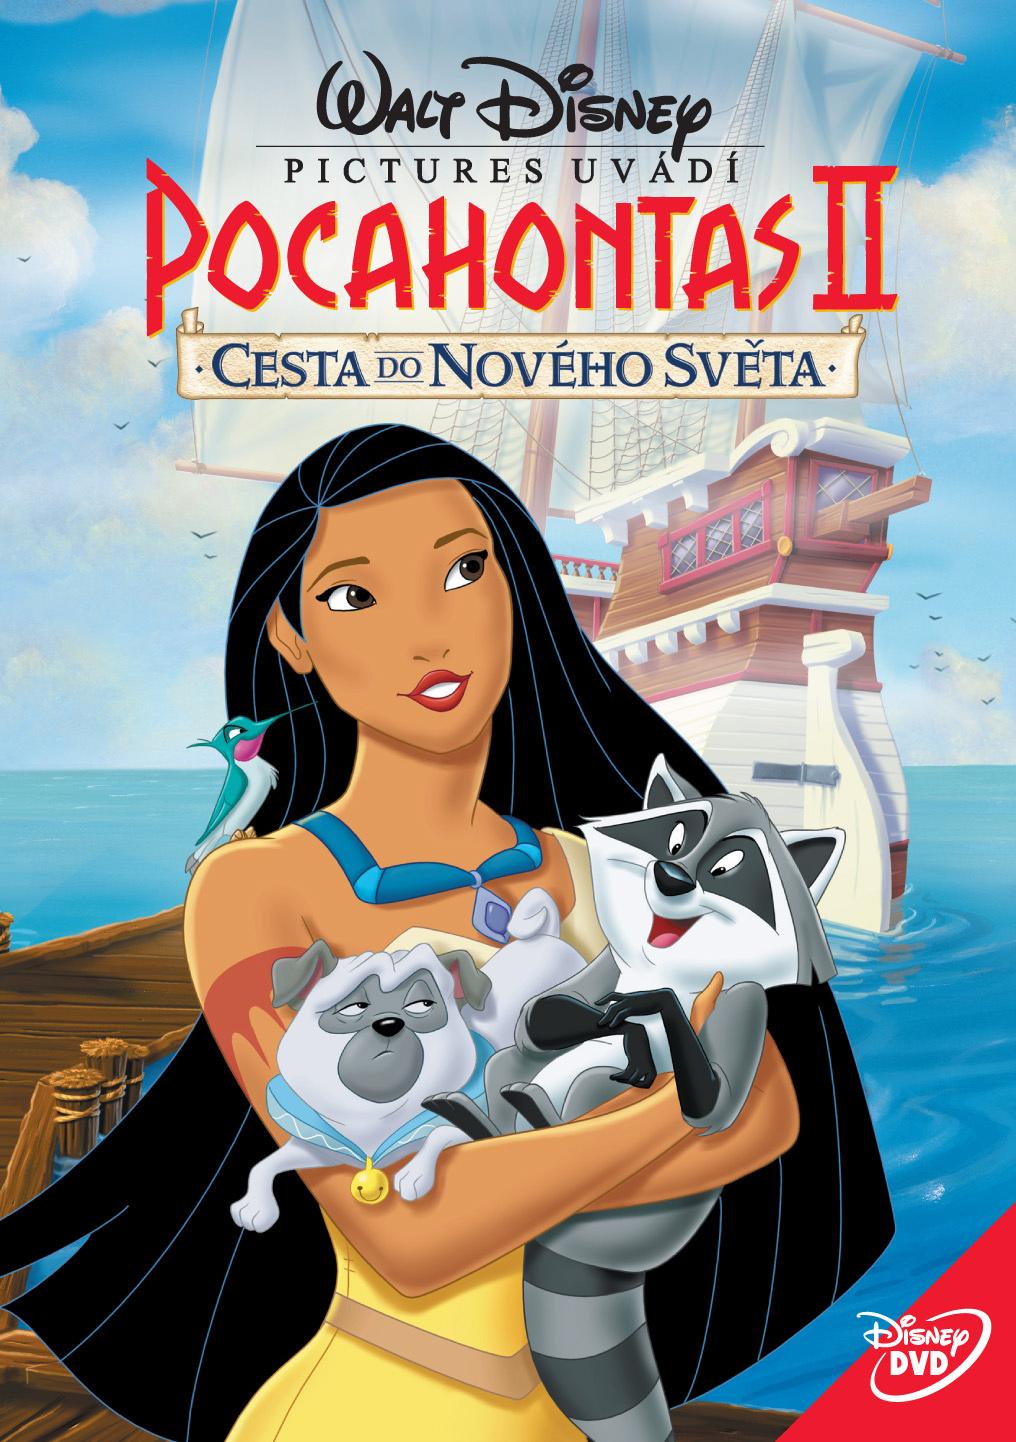 Spustit online film zdarma Pocahontas 2: Cesta domů / Pocahontas II: Cesta do Nového světa